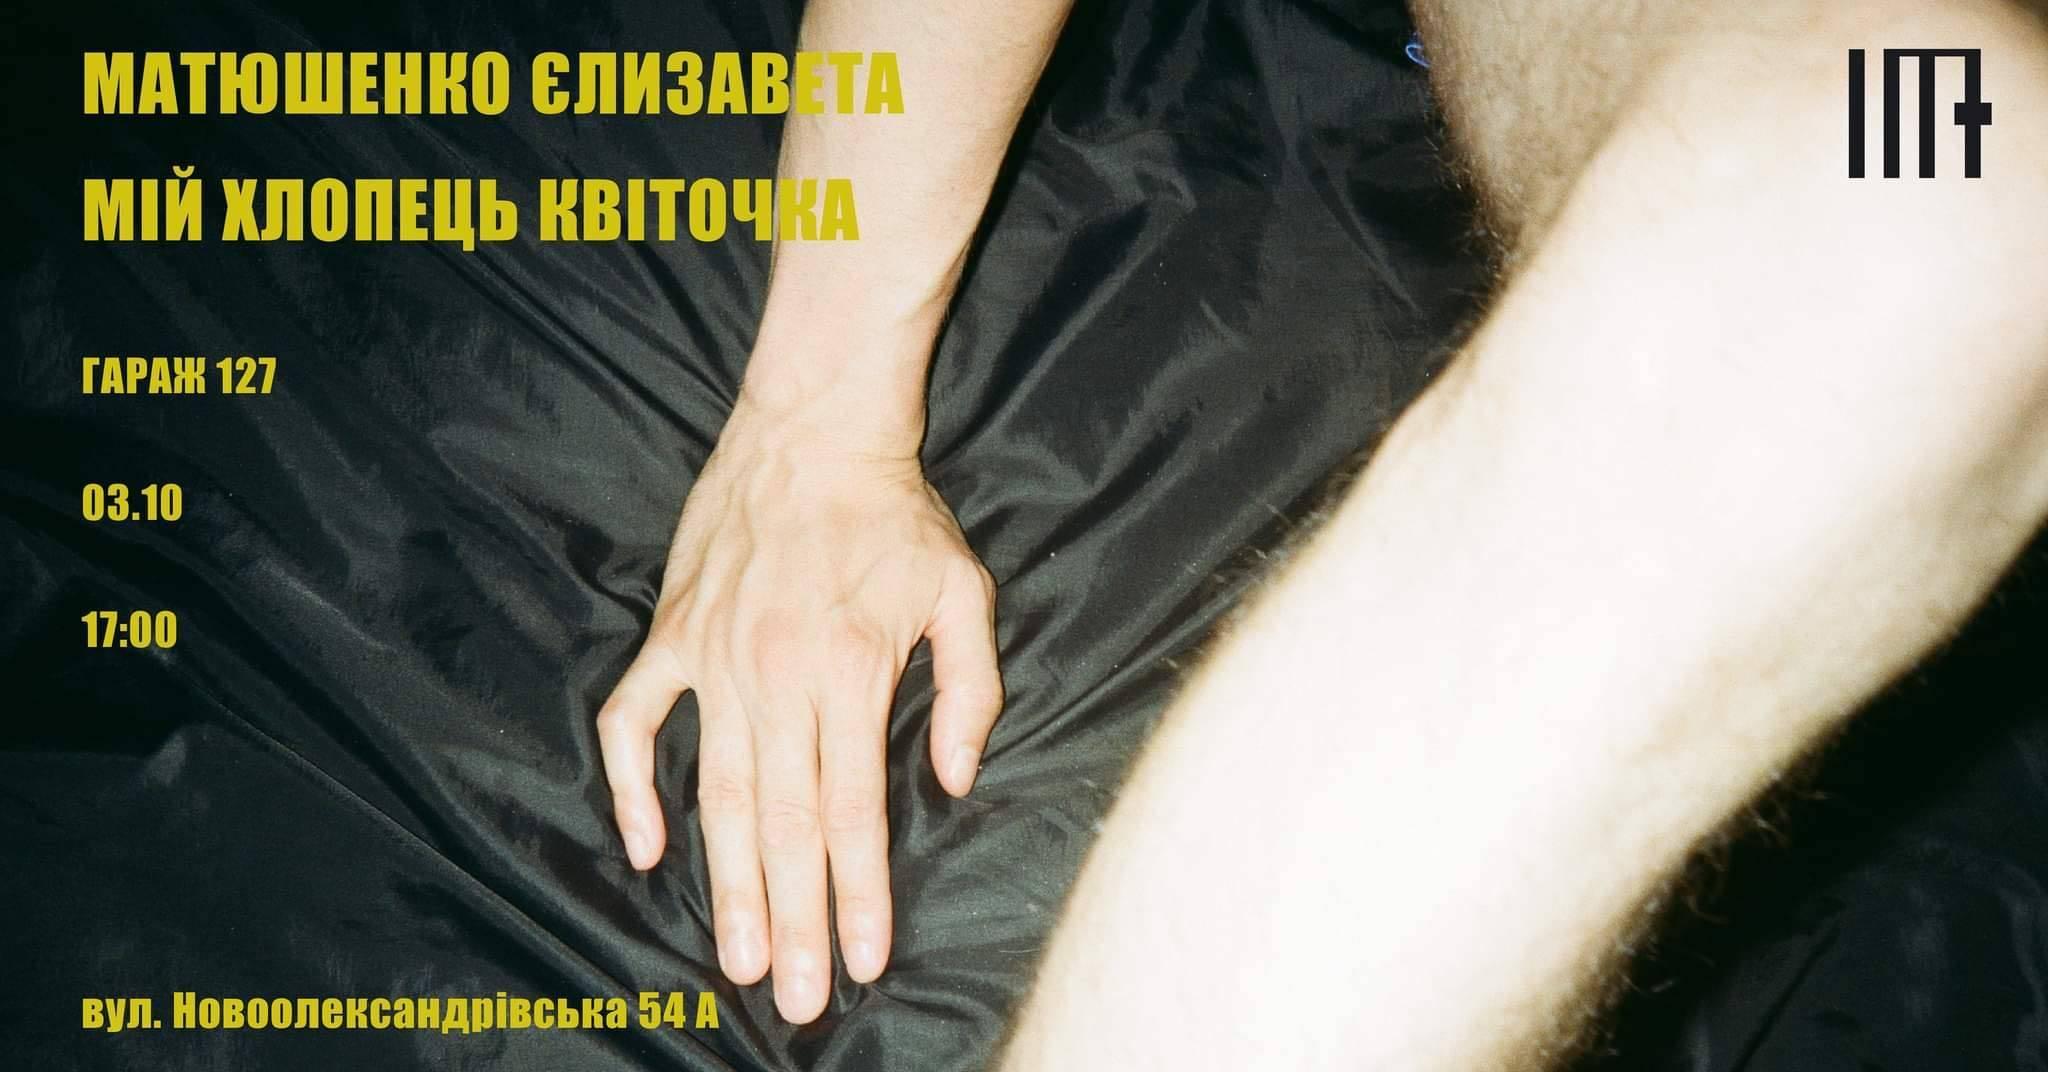 Єлизавета Матюшенко в Garage 127  (Харків)